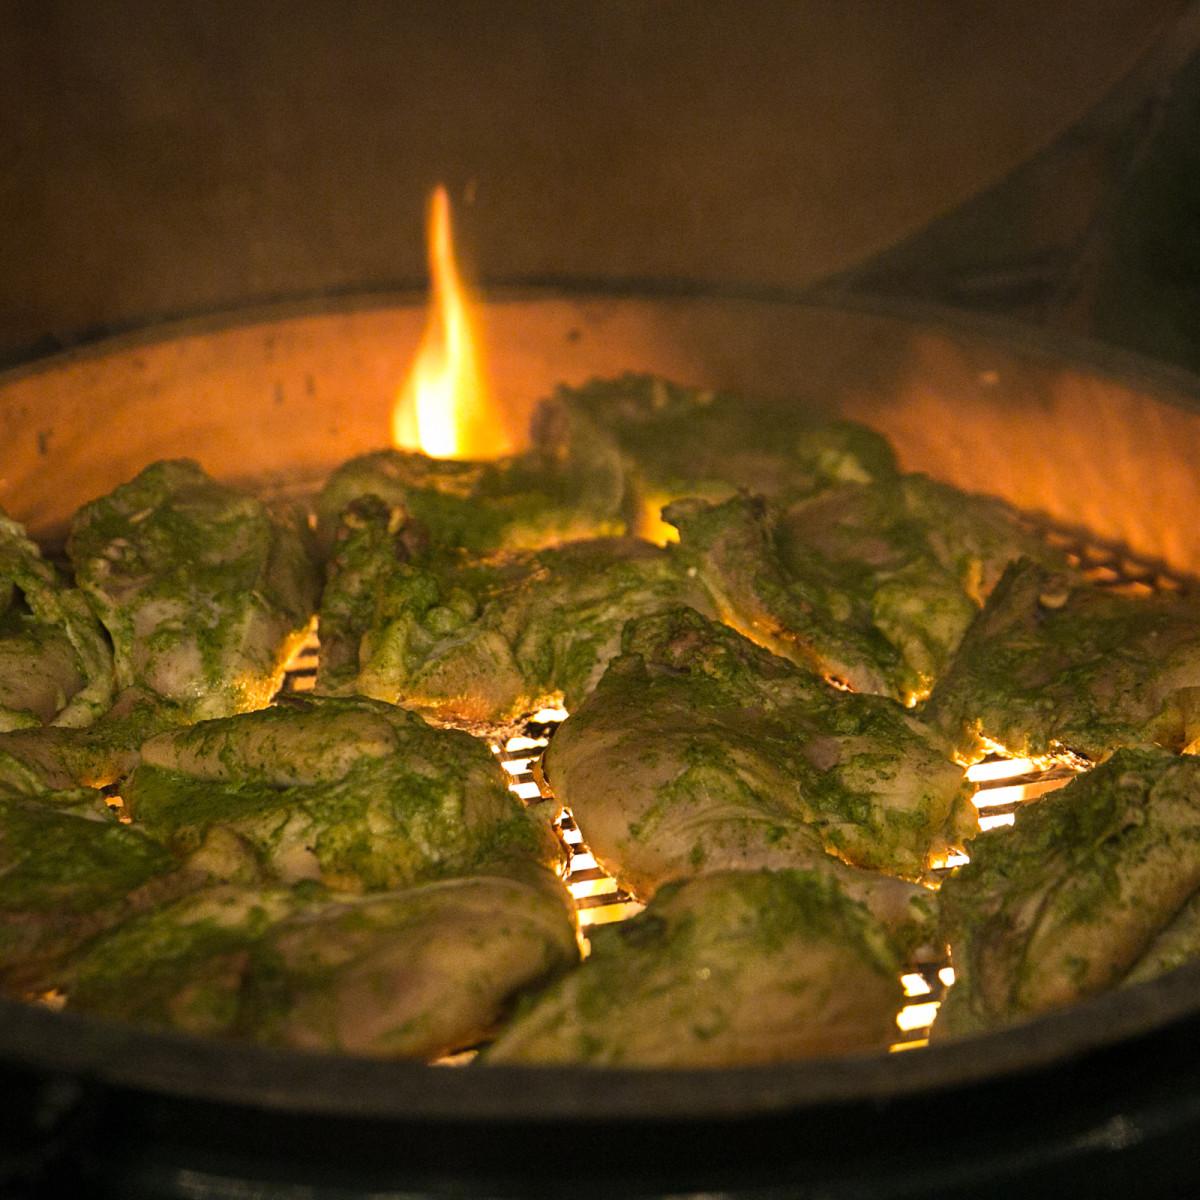 Chris Shepherd cookbook party chicken grilling